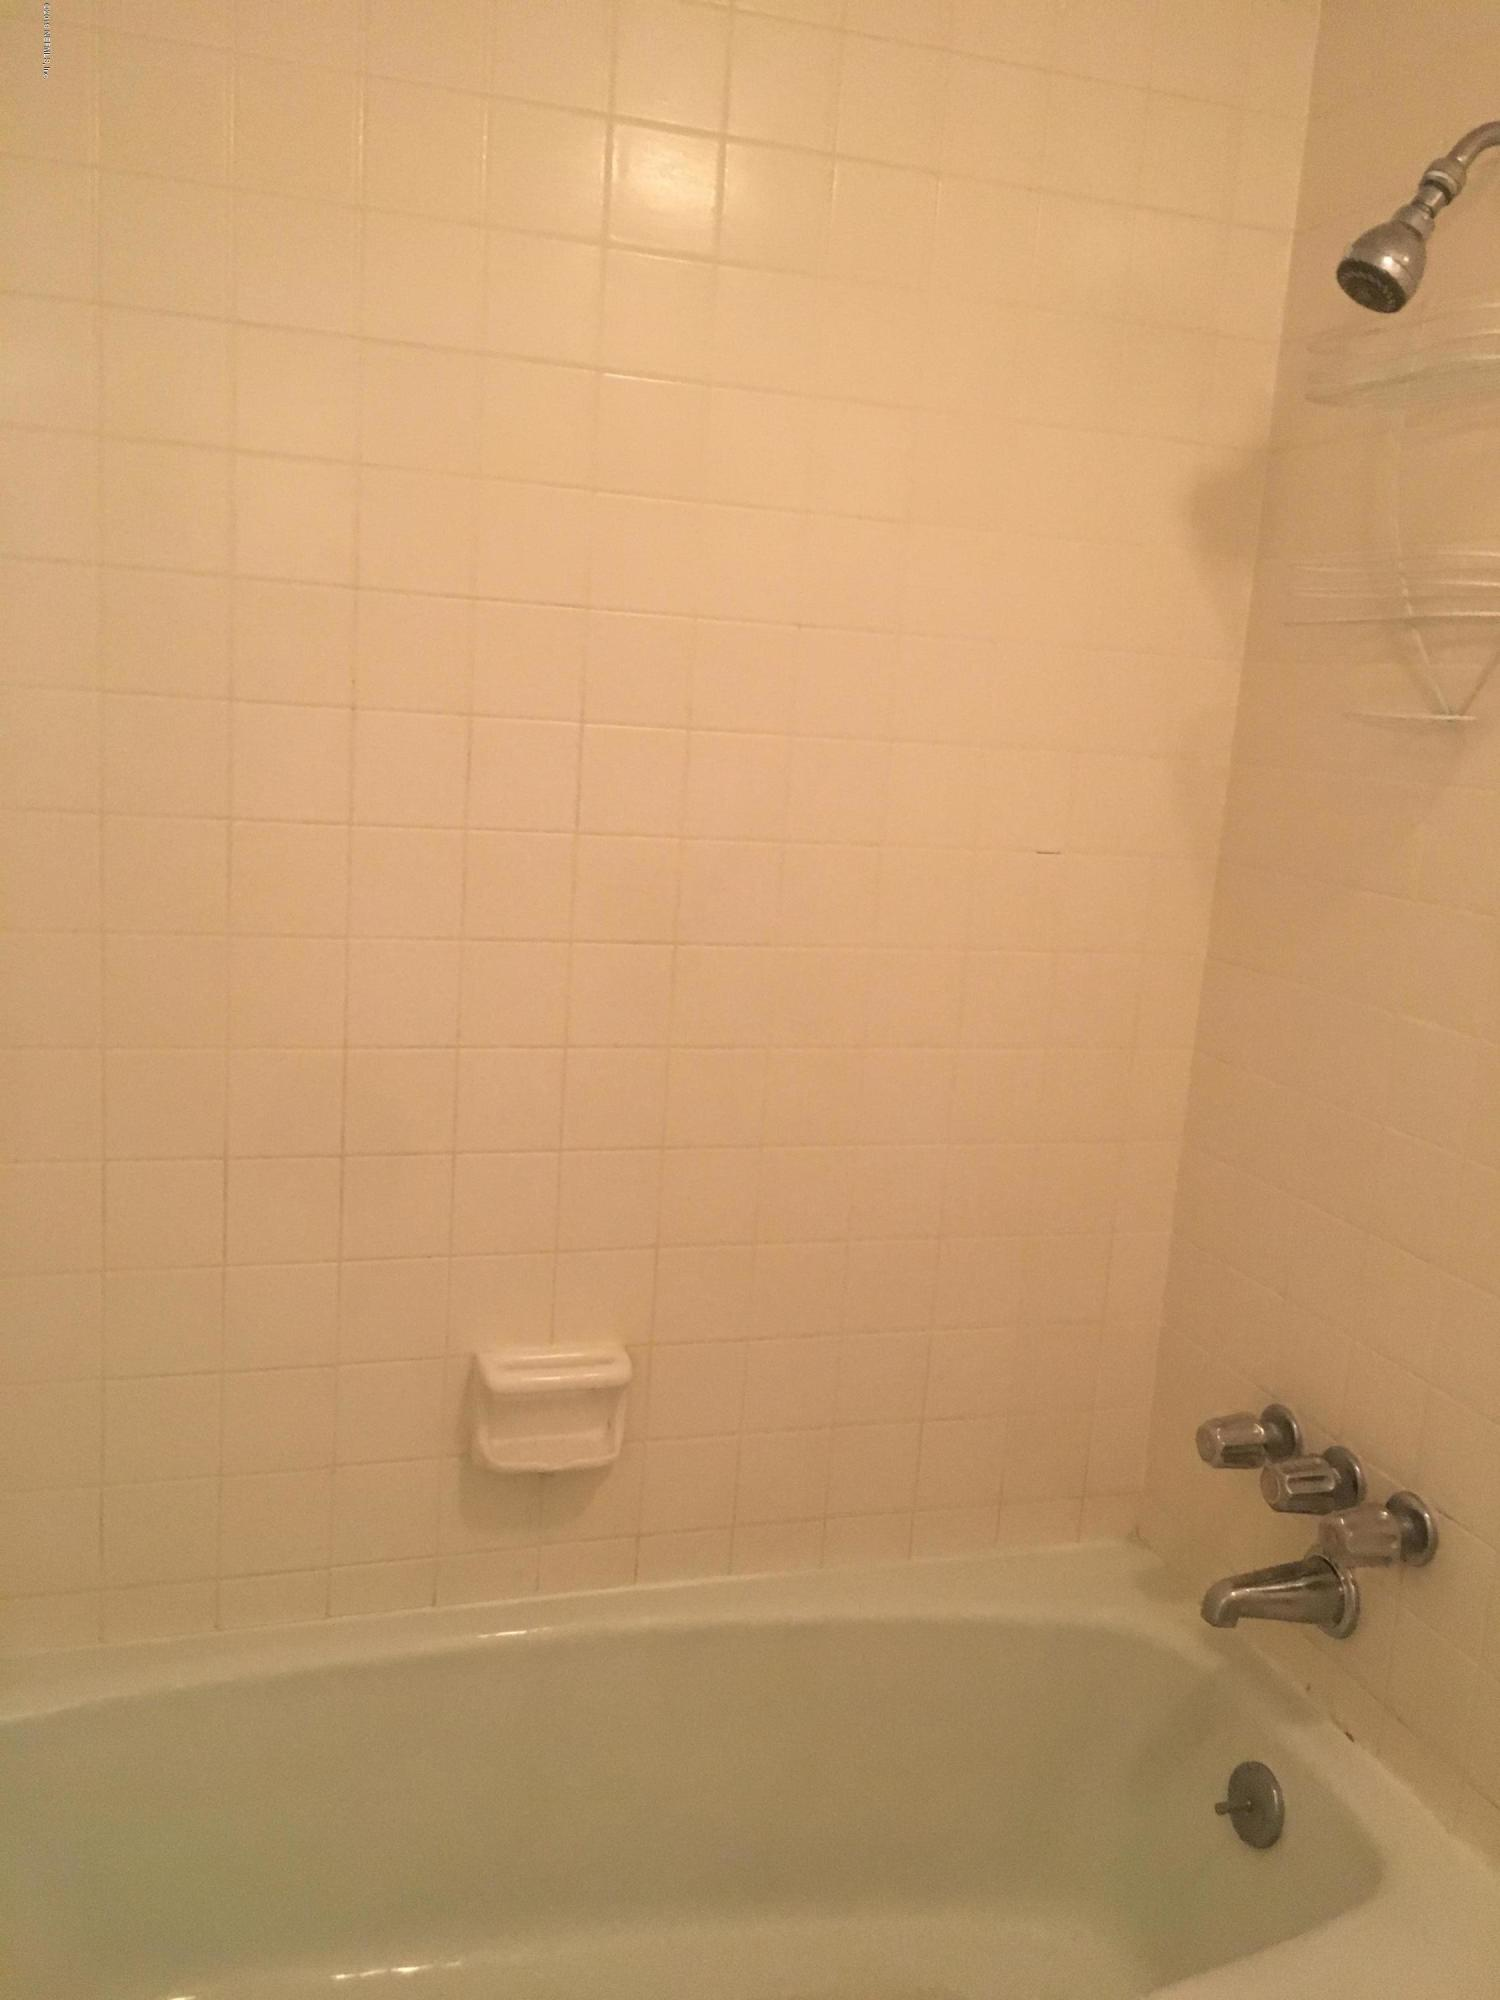 7703 LAS PALMAS, JACKSONVILLE, FLORIDA 32256, 2 Bedrooms Bedrooms, ,2 BathroomsBathrooms,Condo,For sale,LAS PALMAS,1014428